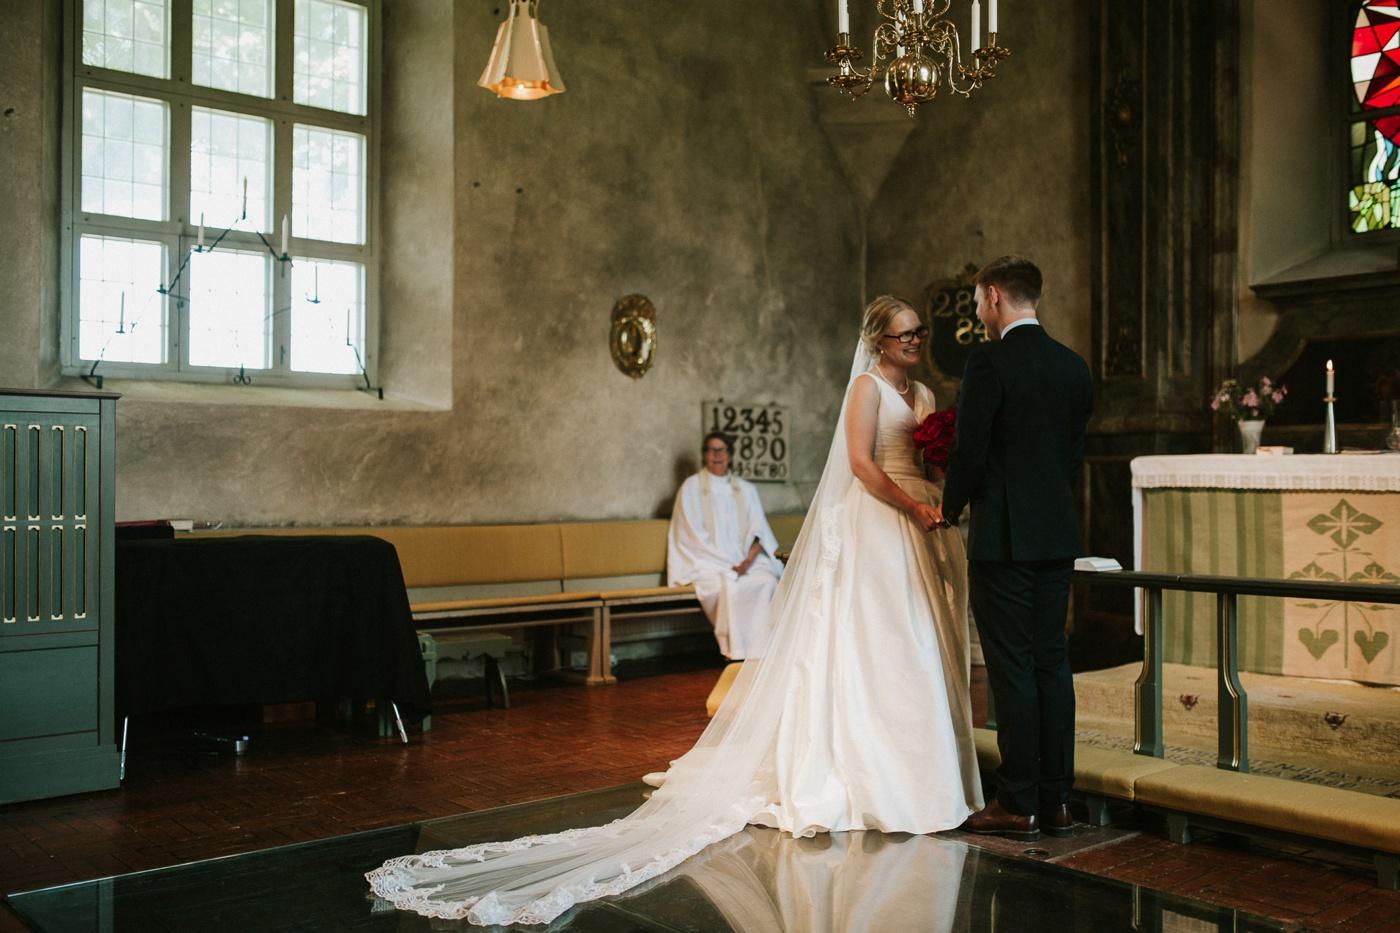 ceciliajoakim_sweden-countryside-summer-wedding_melbourne-fun-quirky-wedding-photography_11